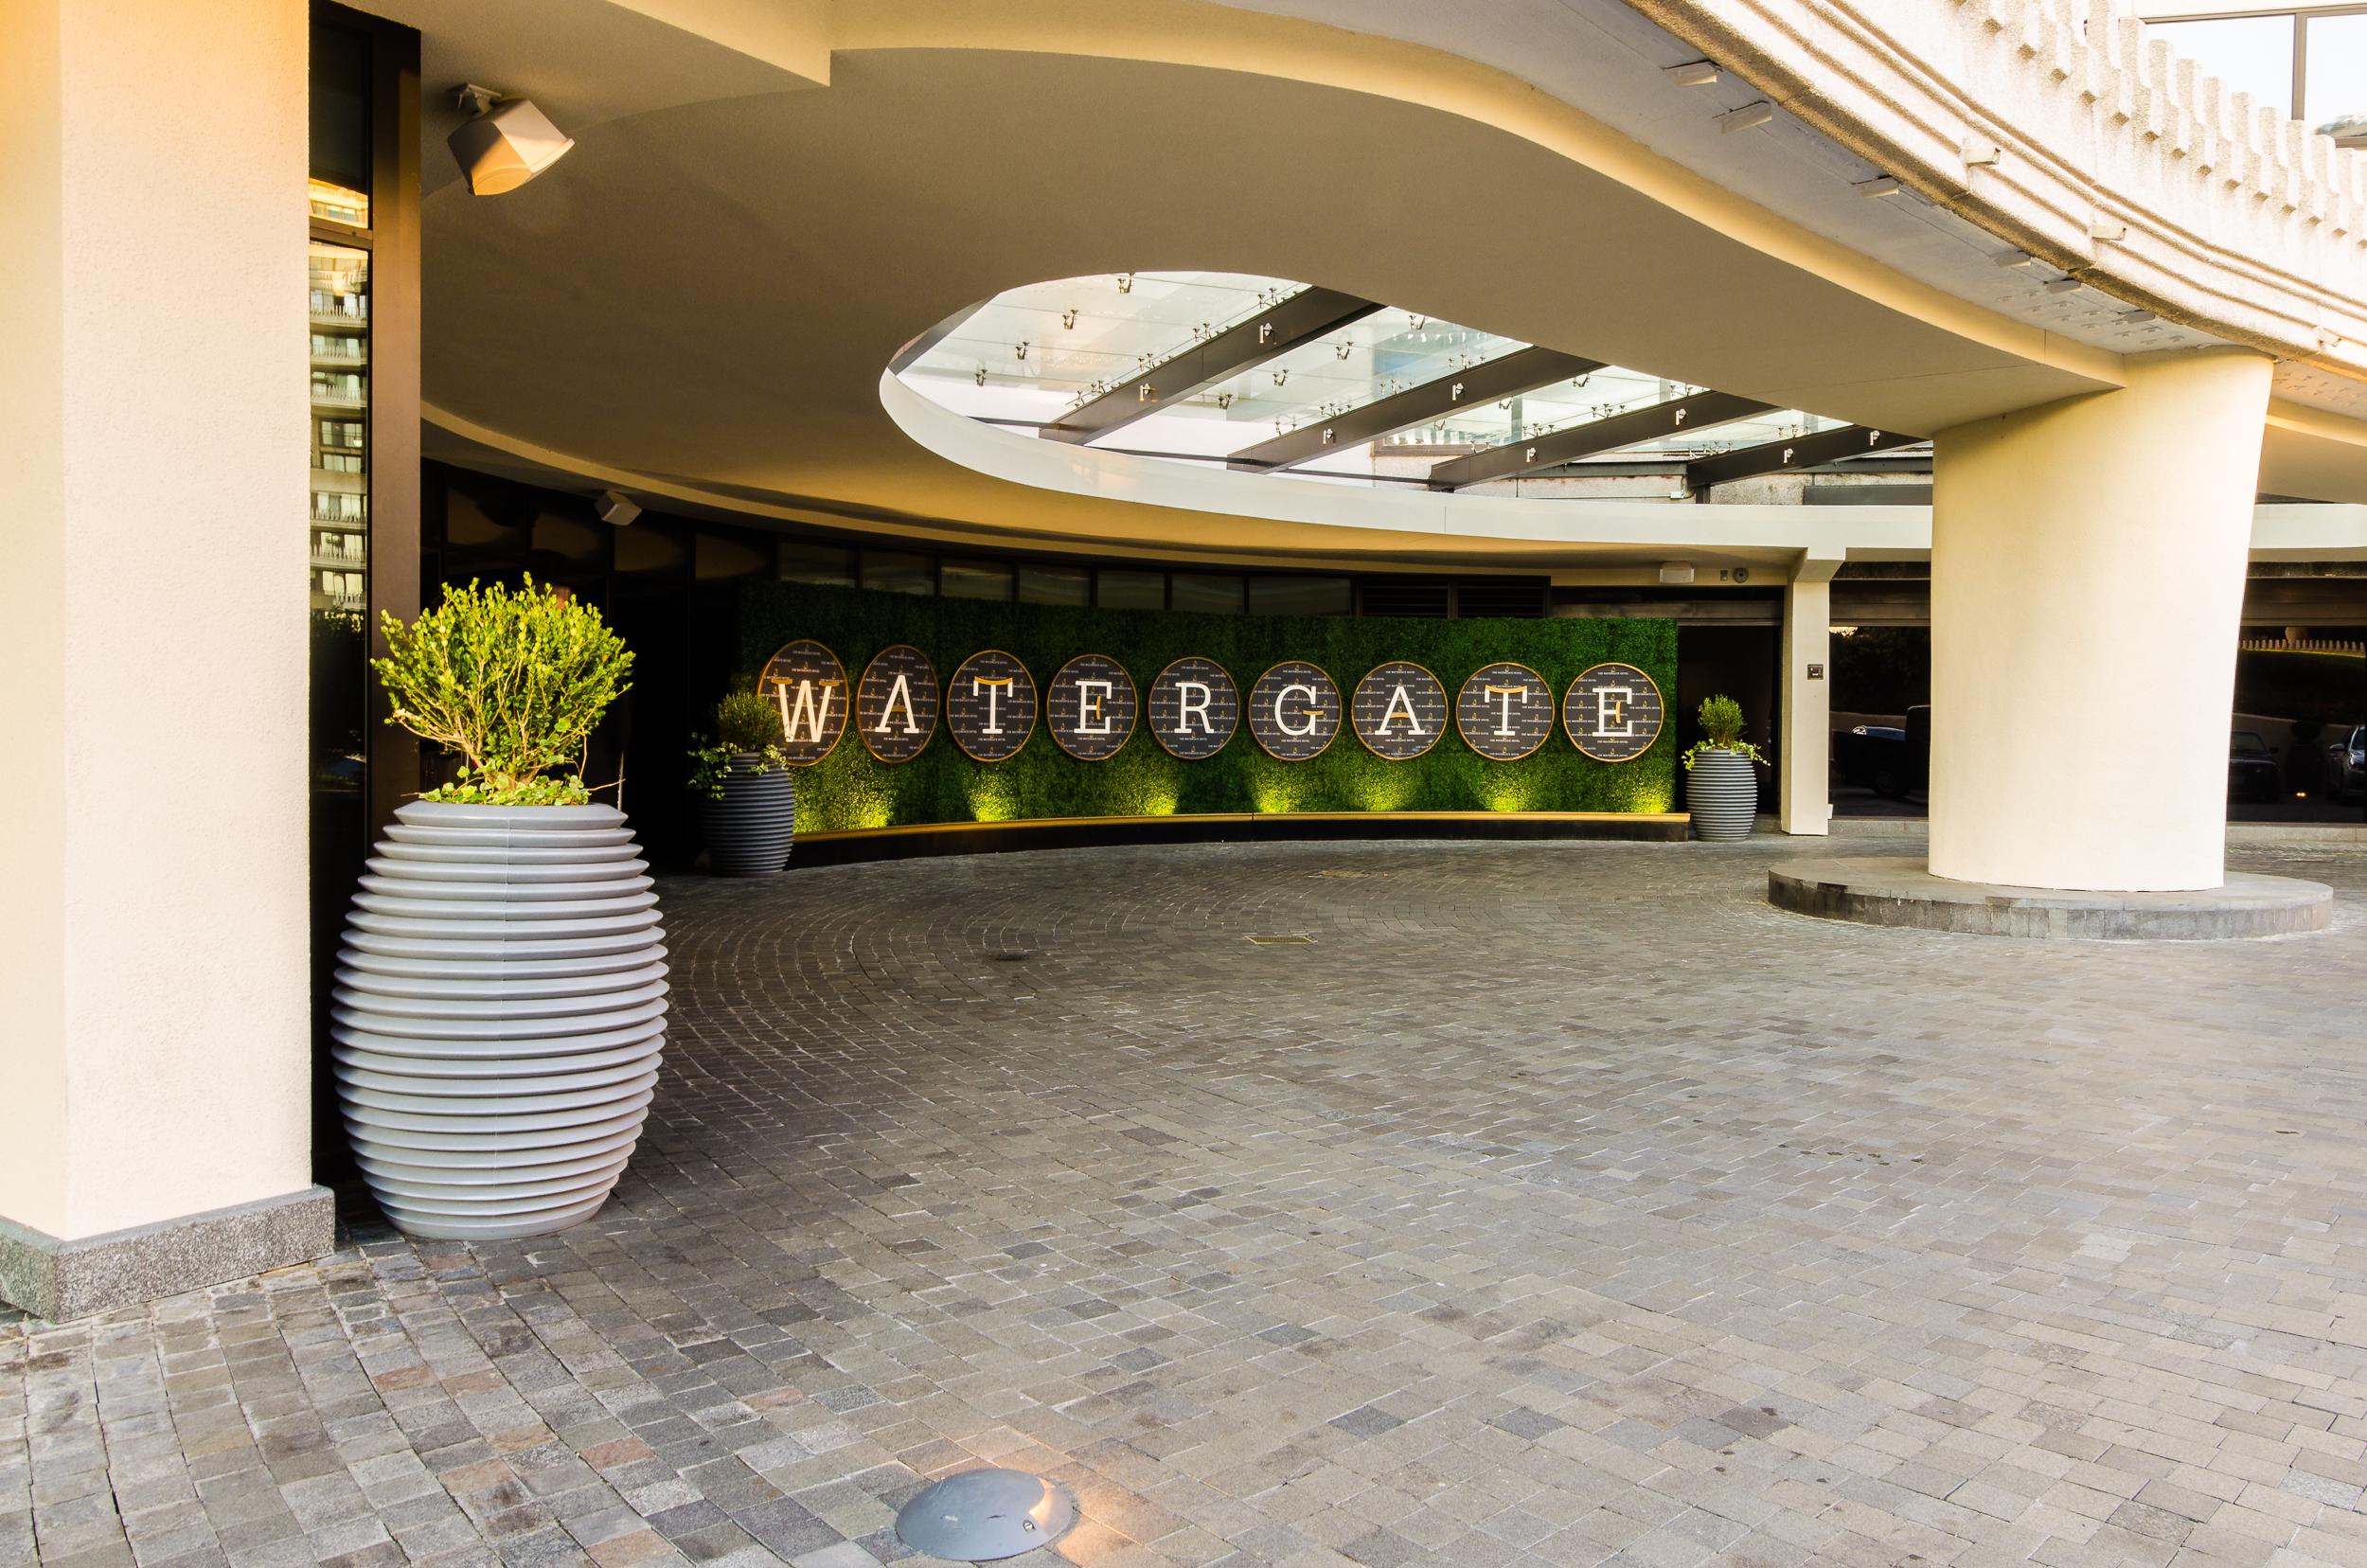 17_Watergate Hotel 01.jpg